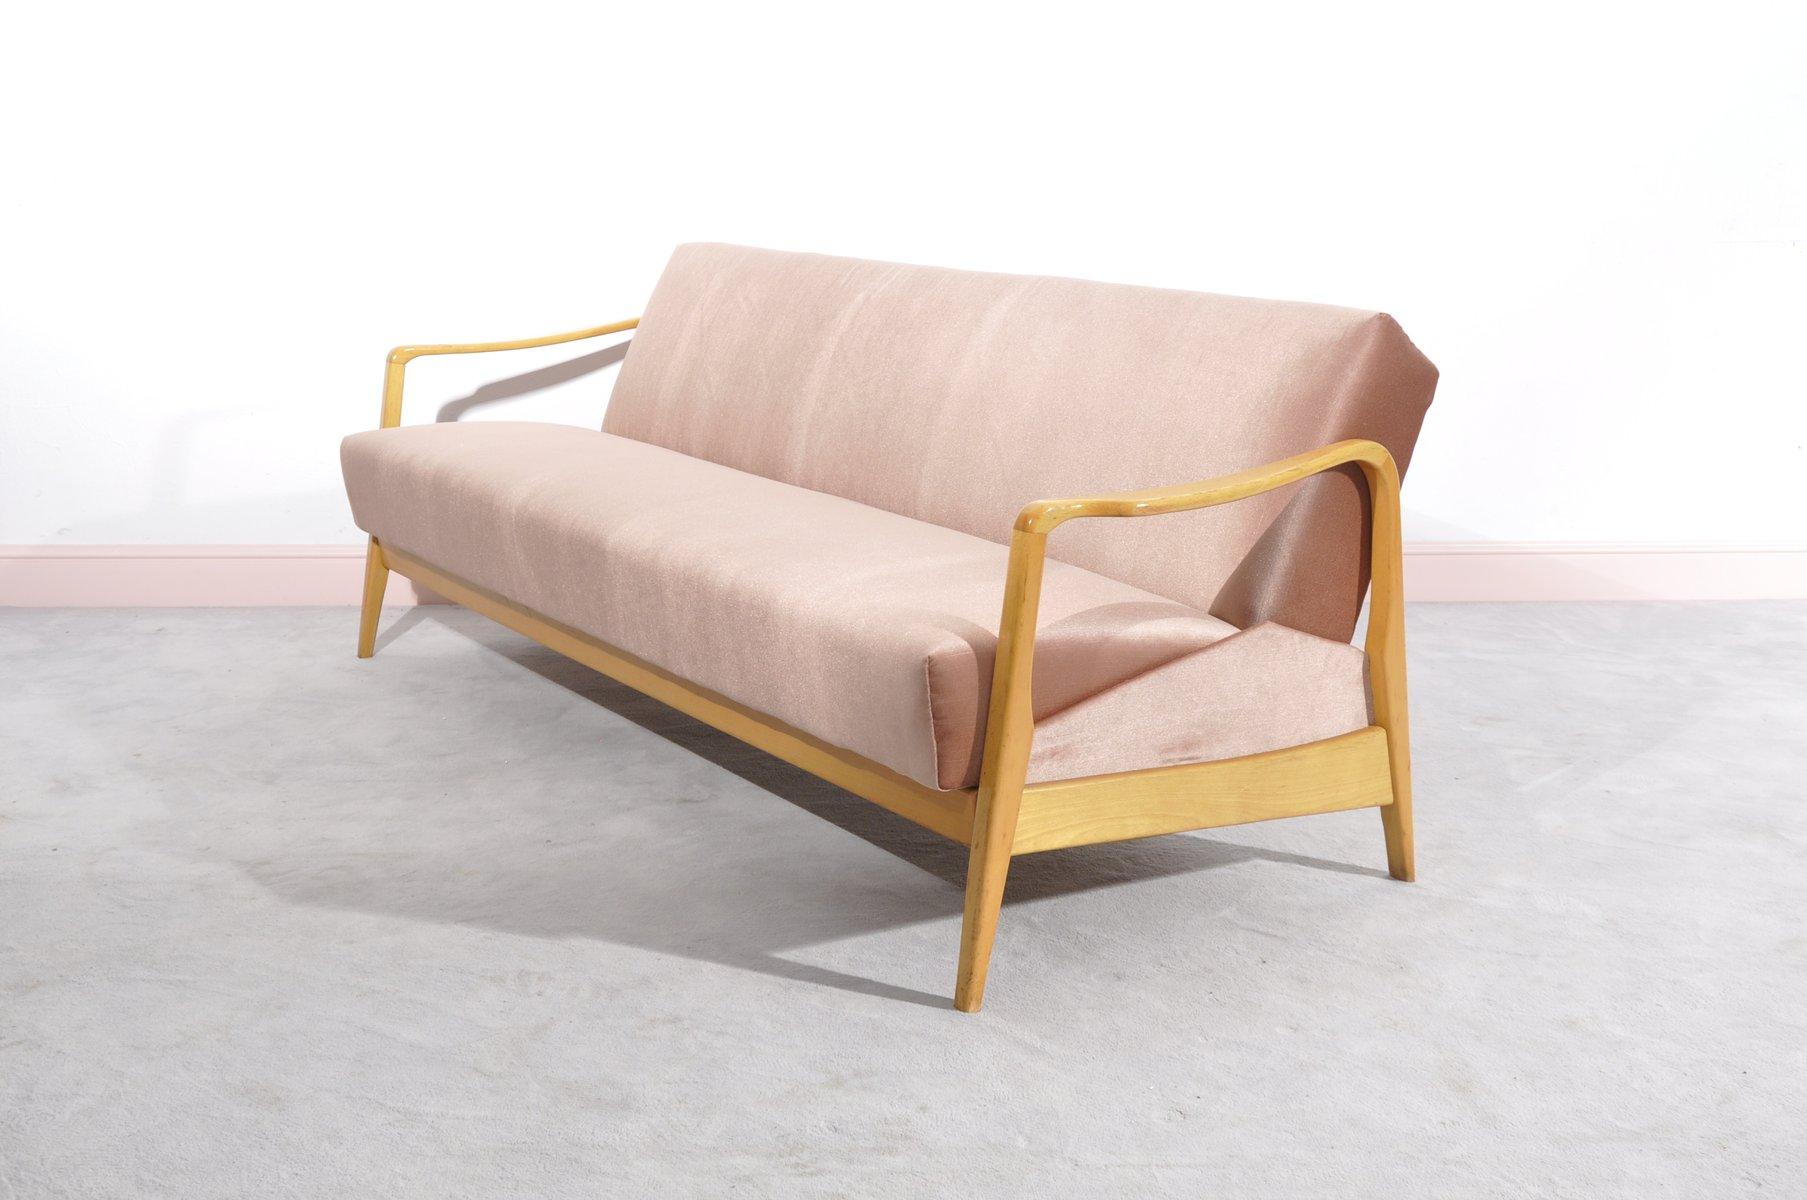 drei sitzer sofa in rosa bei pamono kaufen. Black Bedroom Furniture Sets. Home Design Ideas